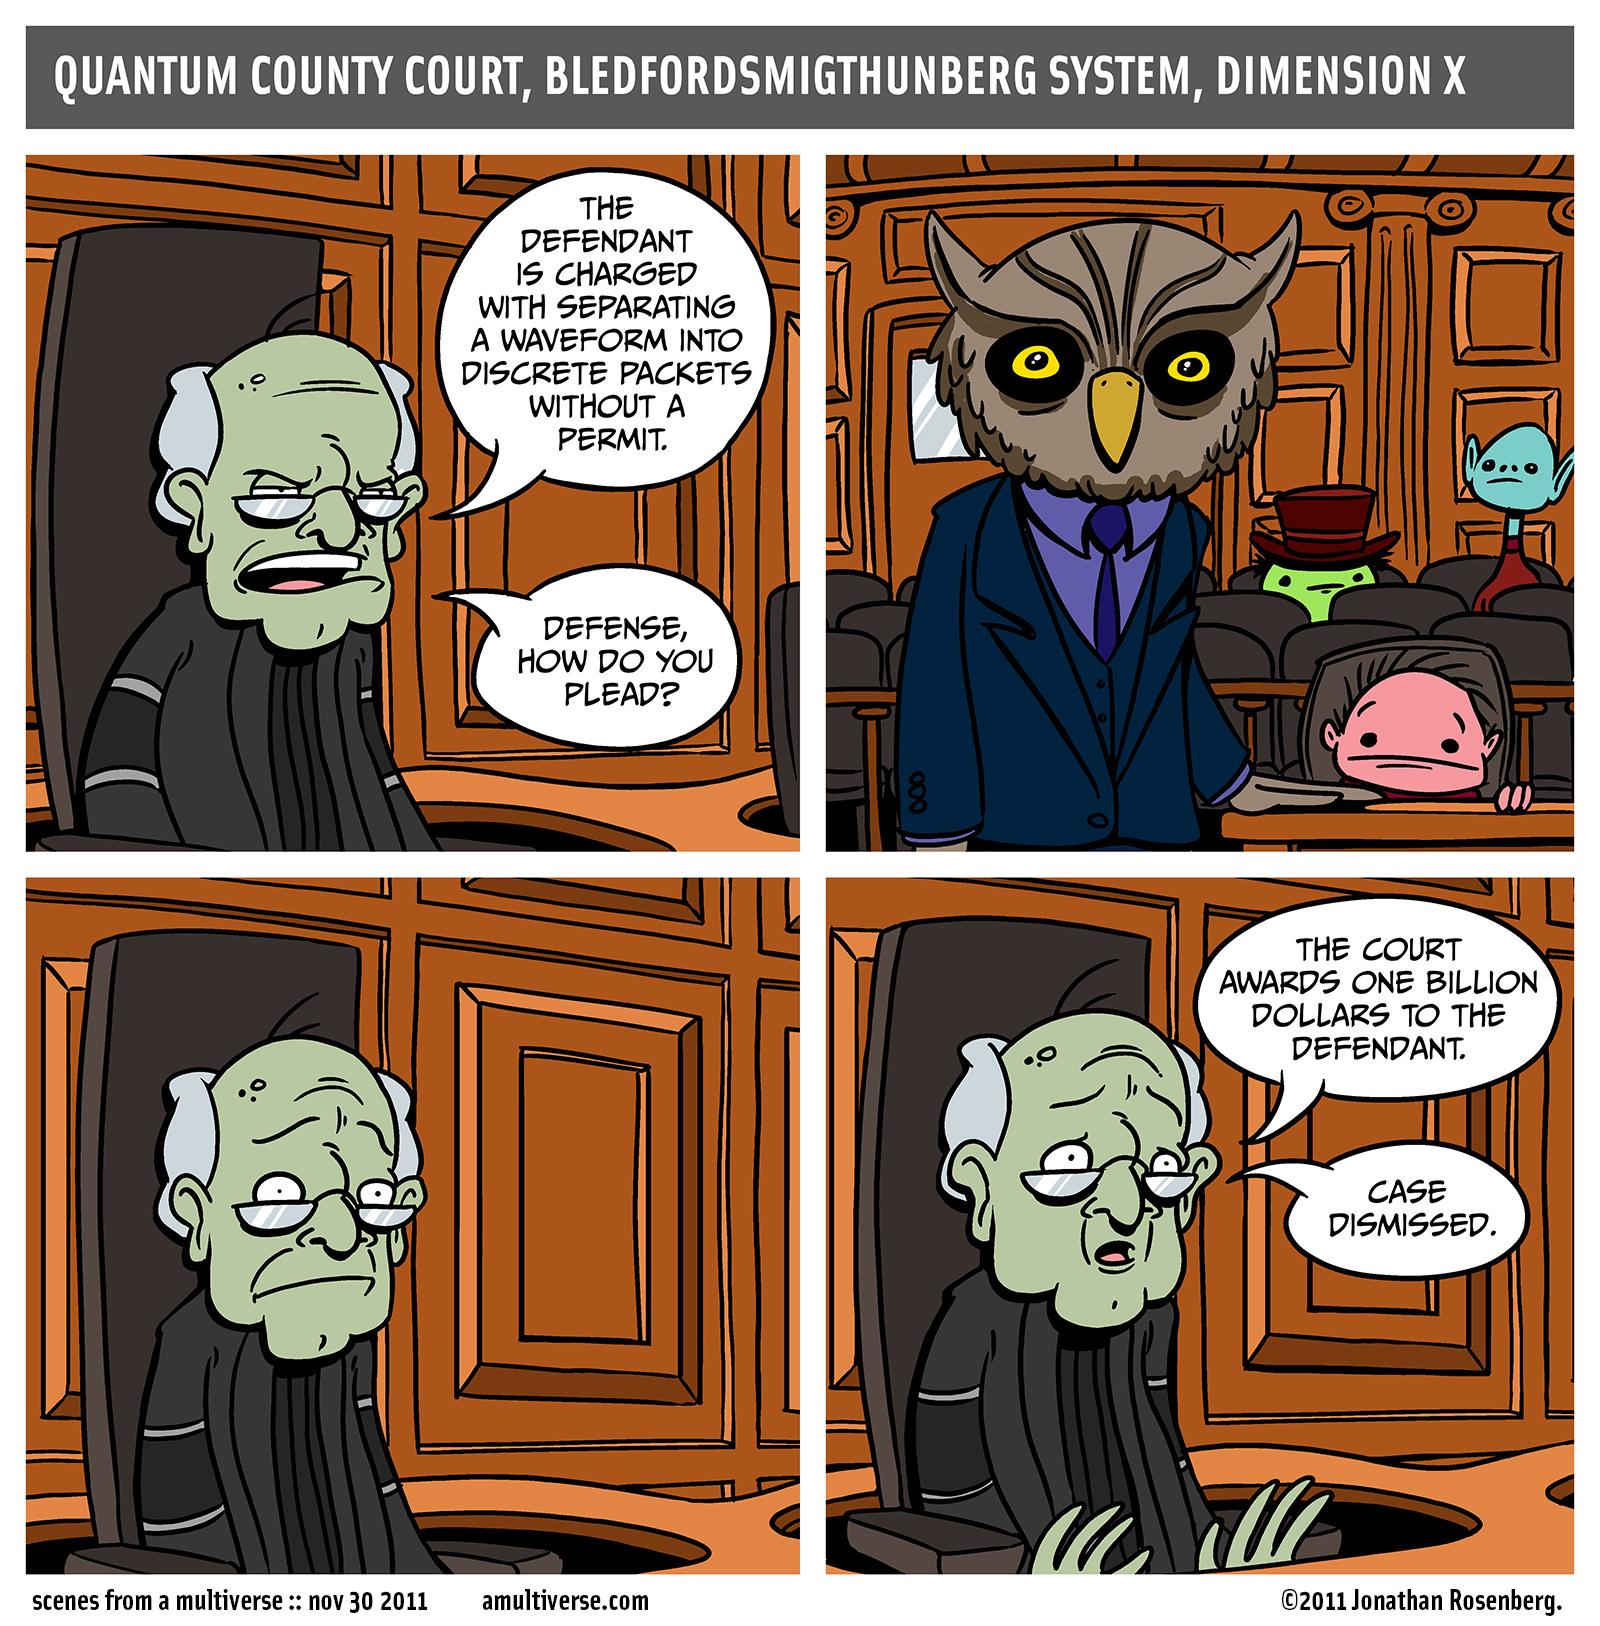 bailiff, please bring mr. greenstein a tray of fresh mice right away